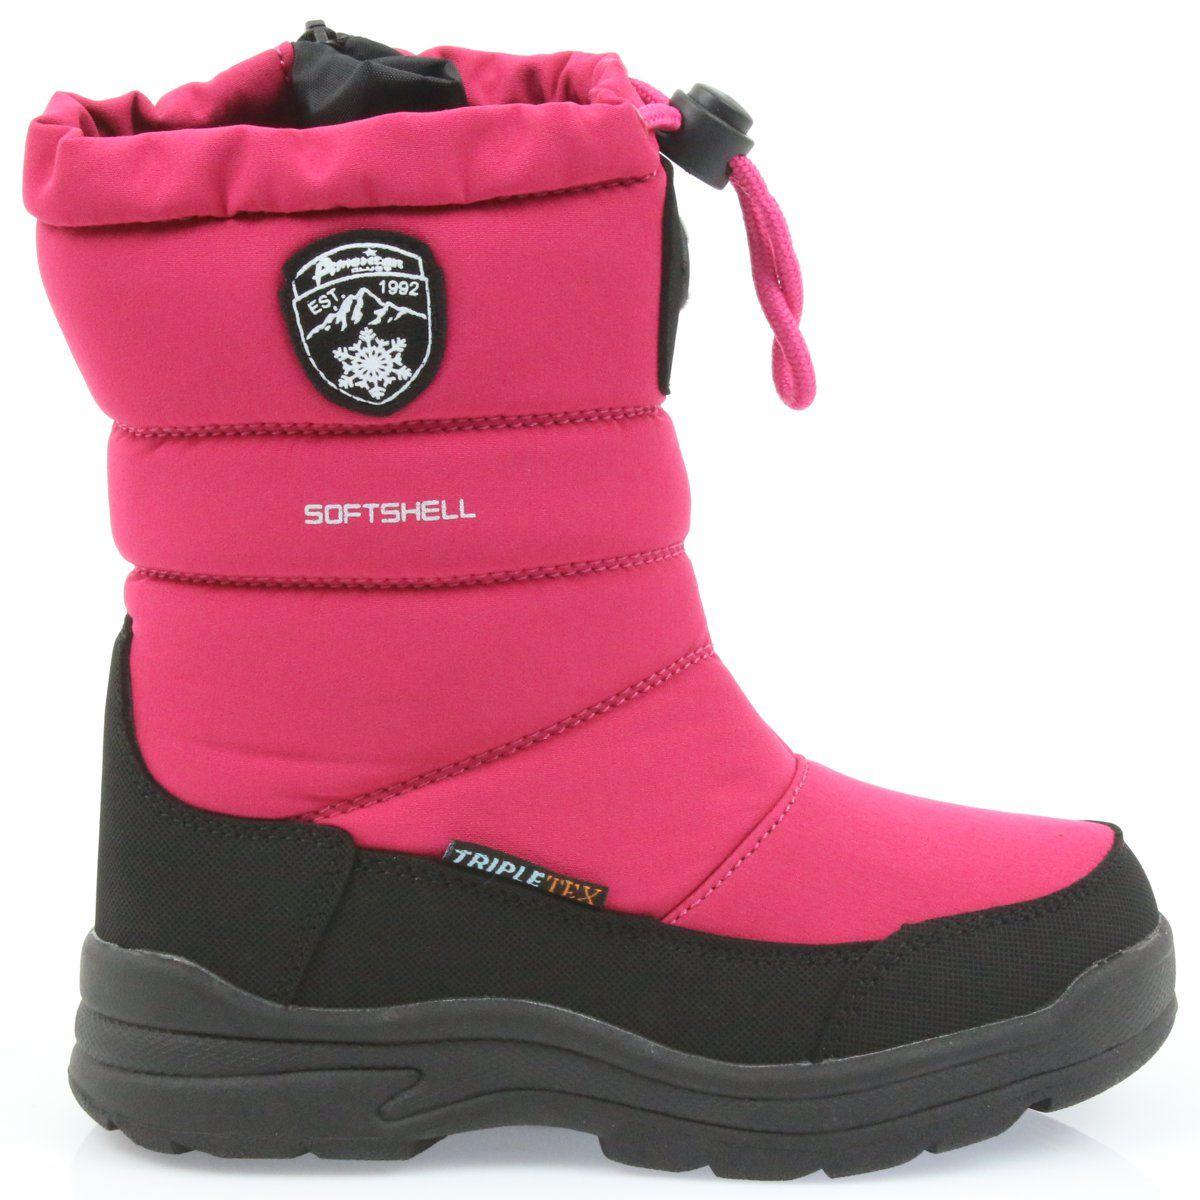 American Club American Buty Zimowe Z Membrana 801sb Czarne Rozowe Boots Shoes Winter Boot